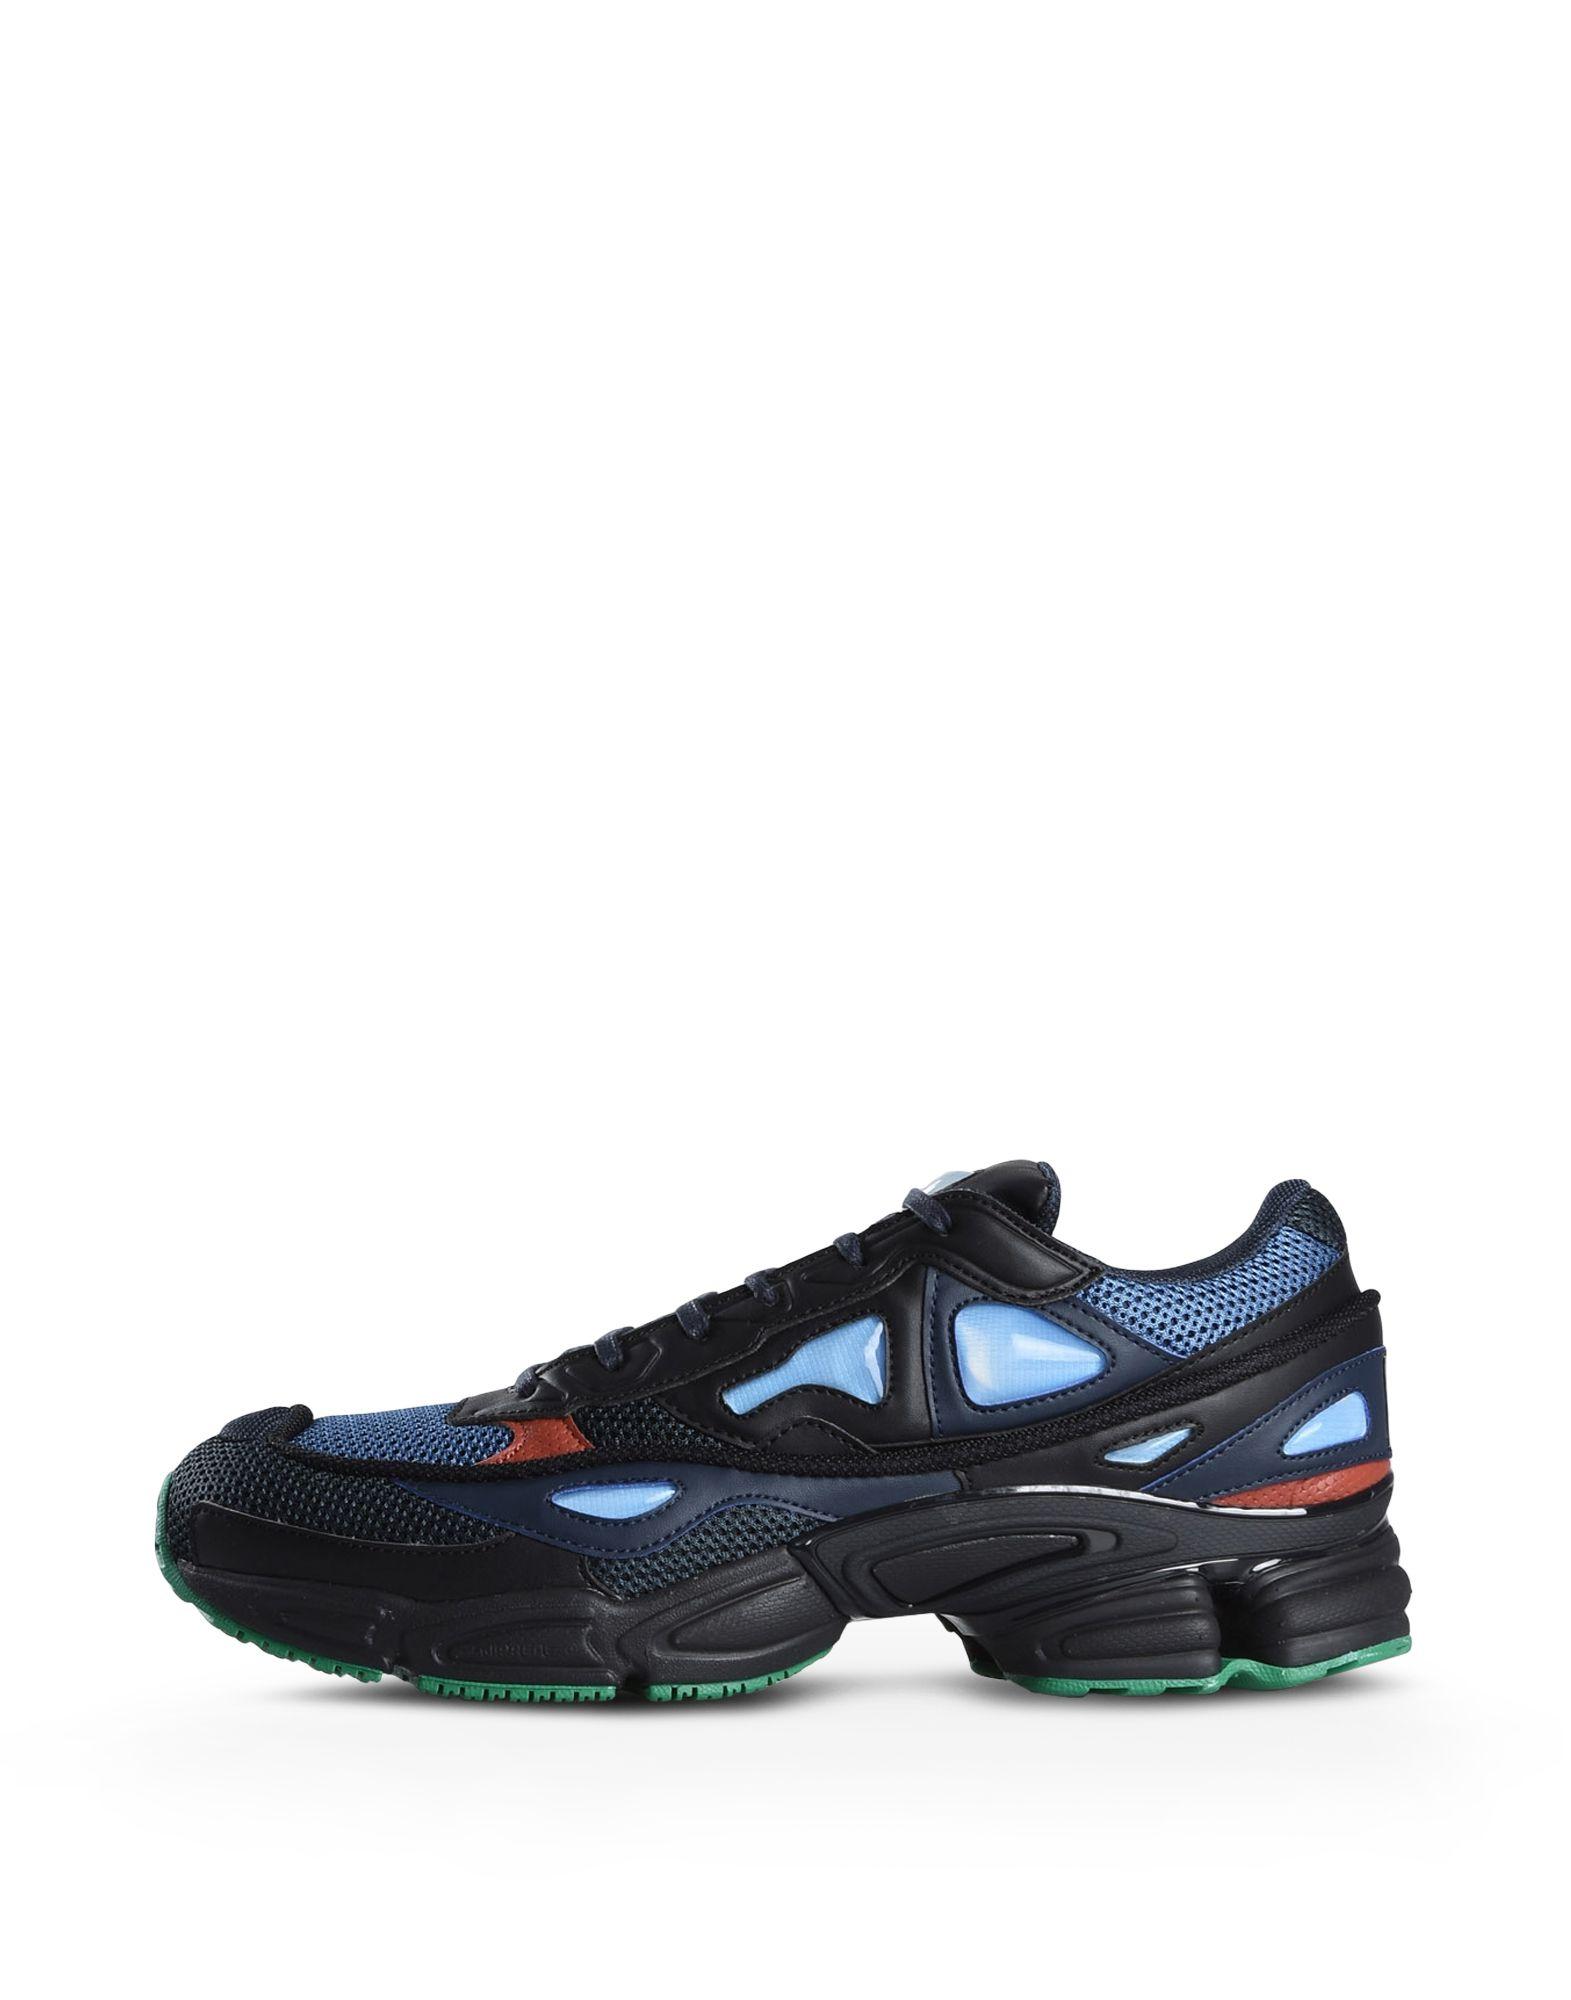 b1026650b320 ... best sneakers RAF SIMONS OZWEEGO 2 Shoes man Y-3 adidas ...